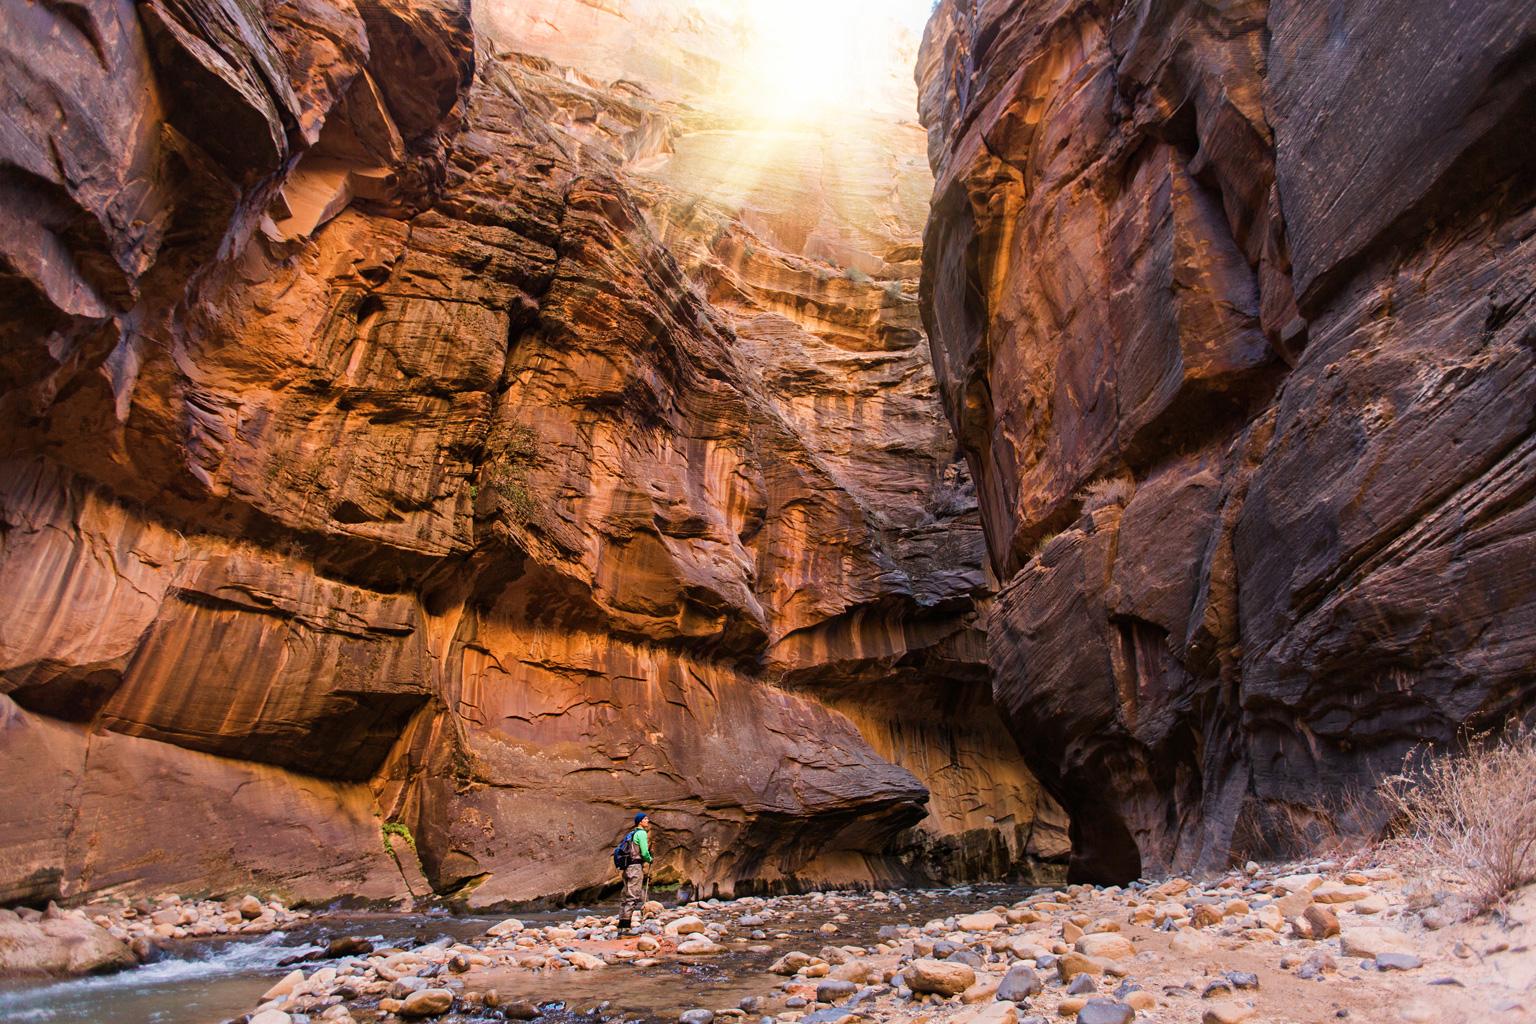 CindyGiovagnoli_Great_Sand_Dunes_Zion_National_Park_Horseshoe_Bend_Truck_Camping_Toyota_The_Narrows_roadtrip_Utah_Colorado-007.jpg